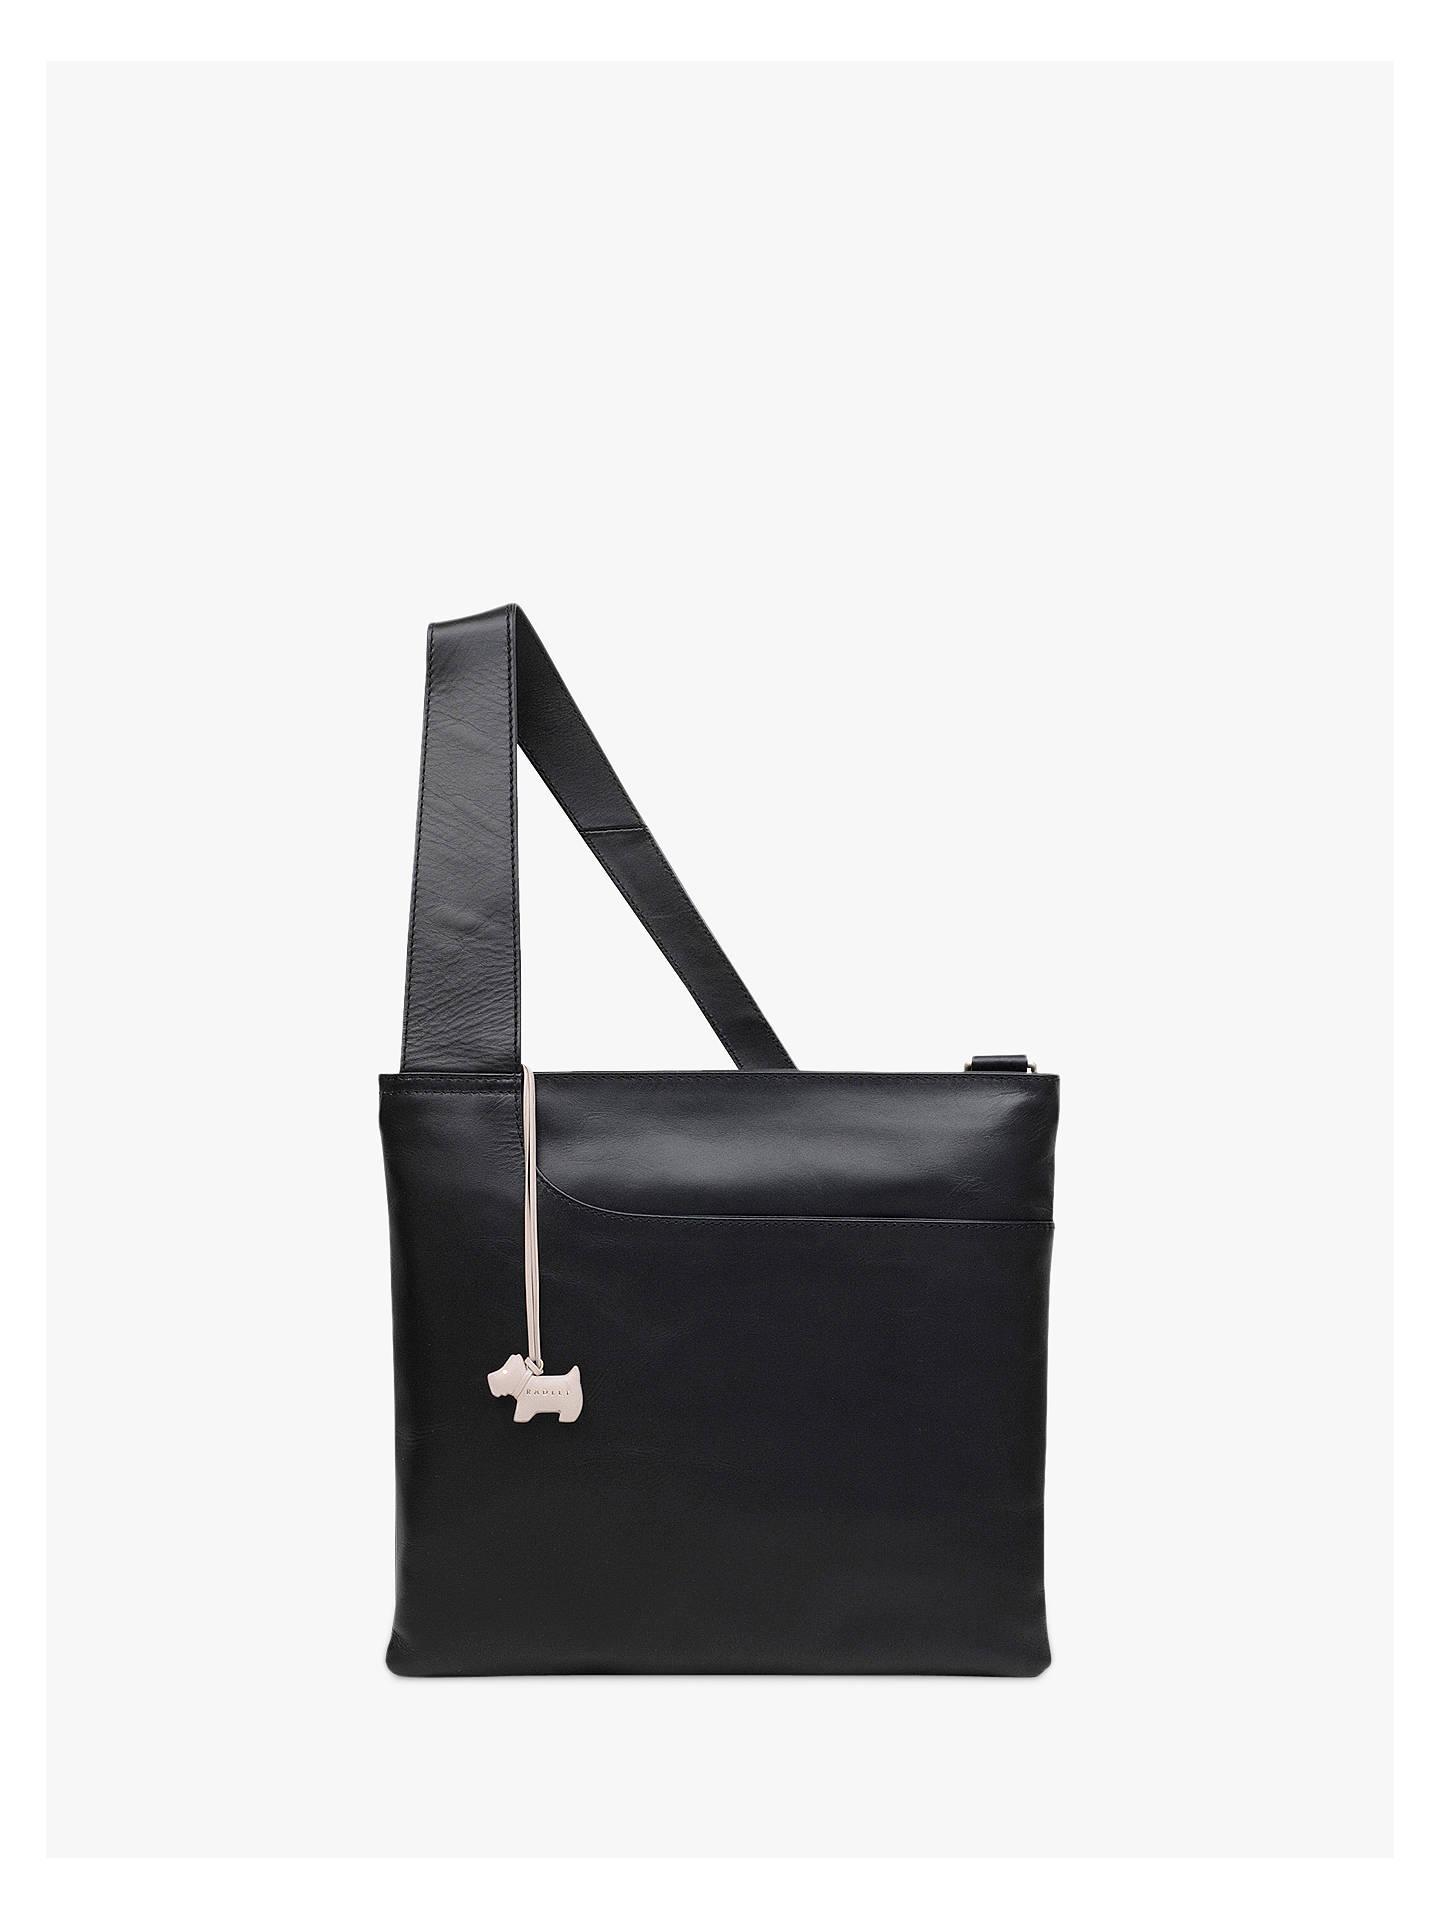 ee248360b75d01 Buy Radley Pockets Leather Large Zip Top Cross Body Bag, Black Online at  johnlewis.